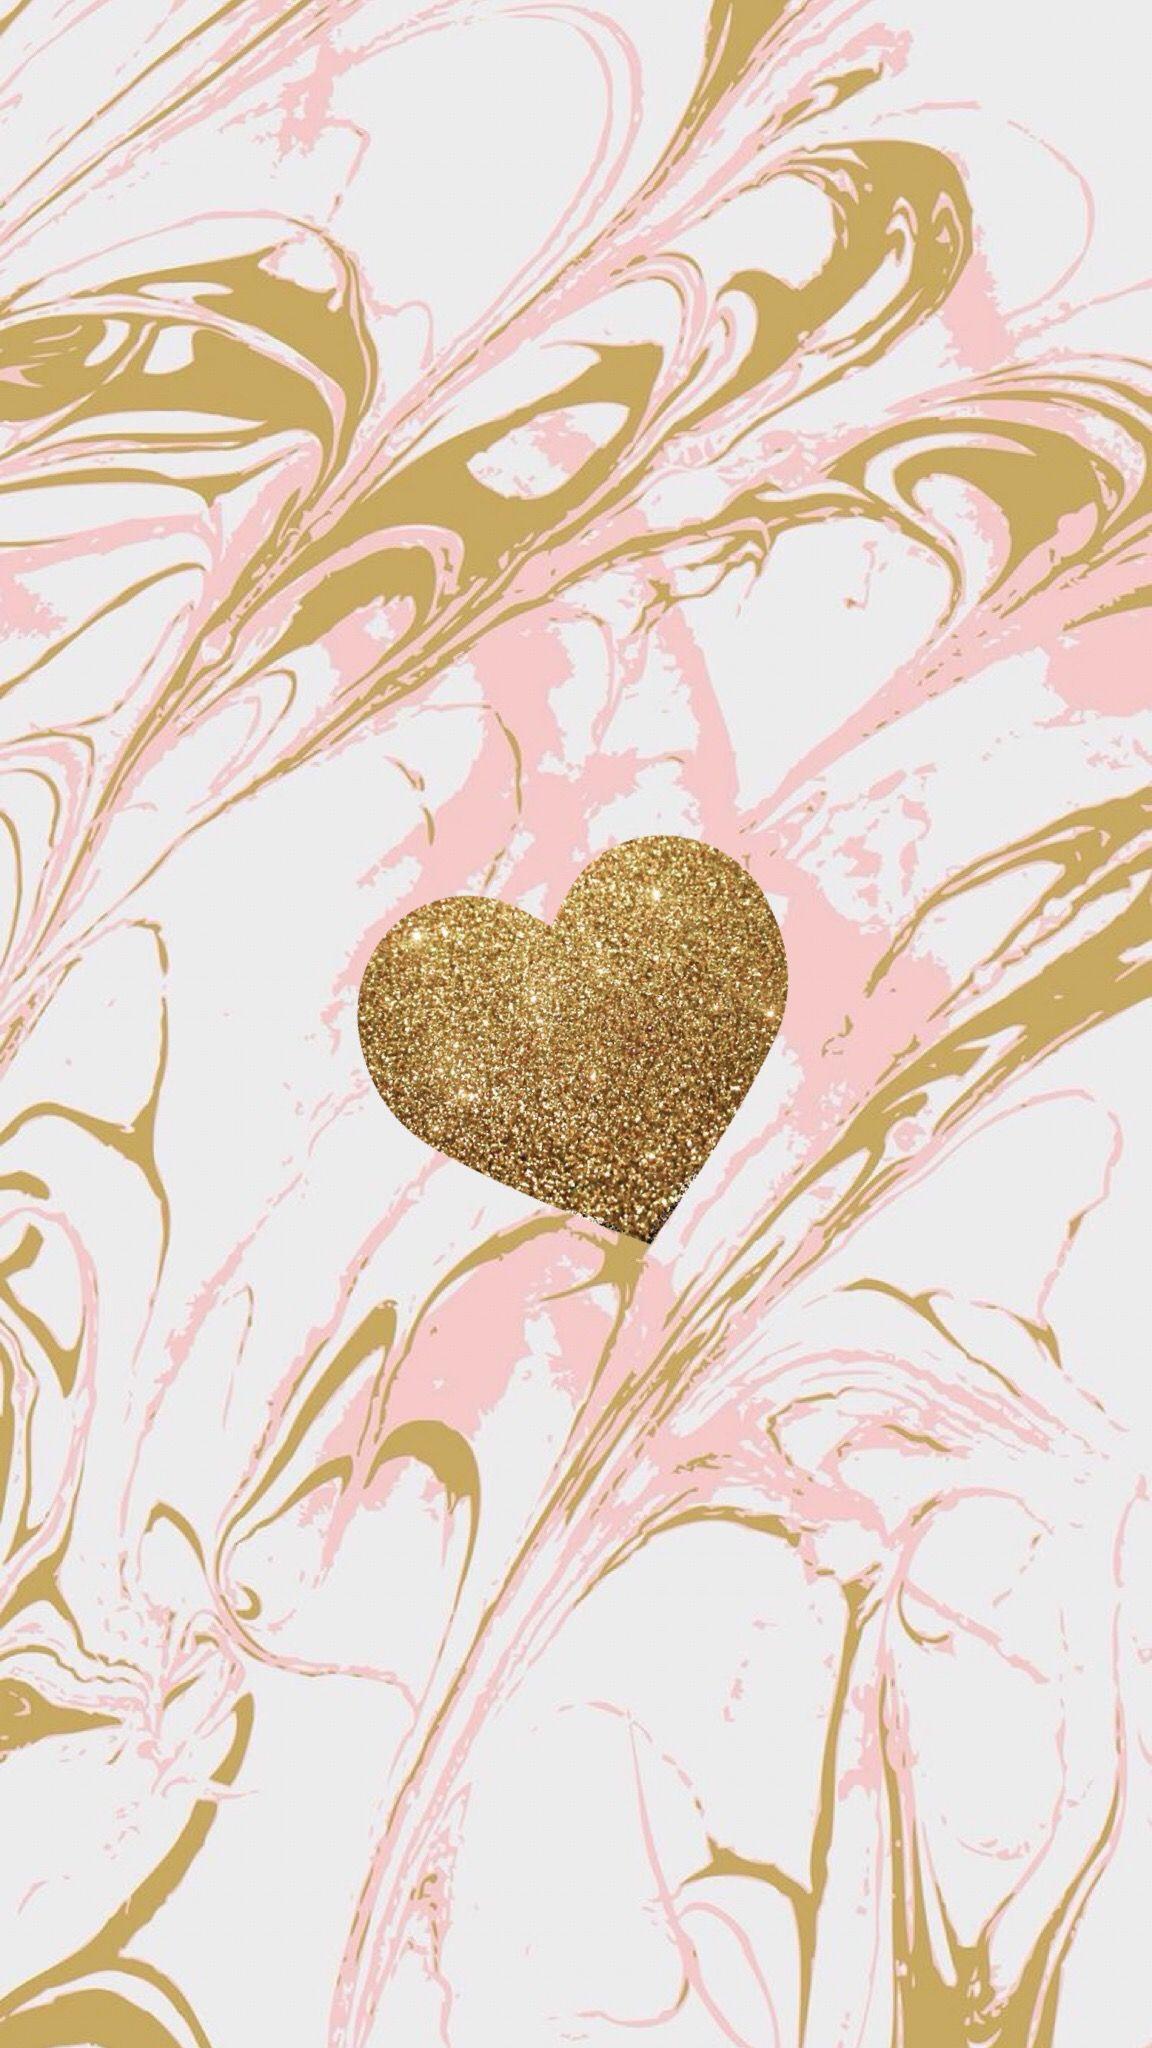 Rose Gold Marble Cute G Letter Wallpaper